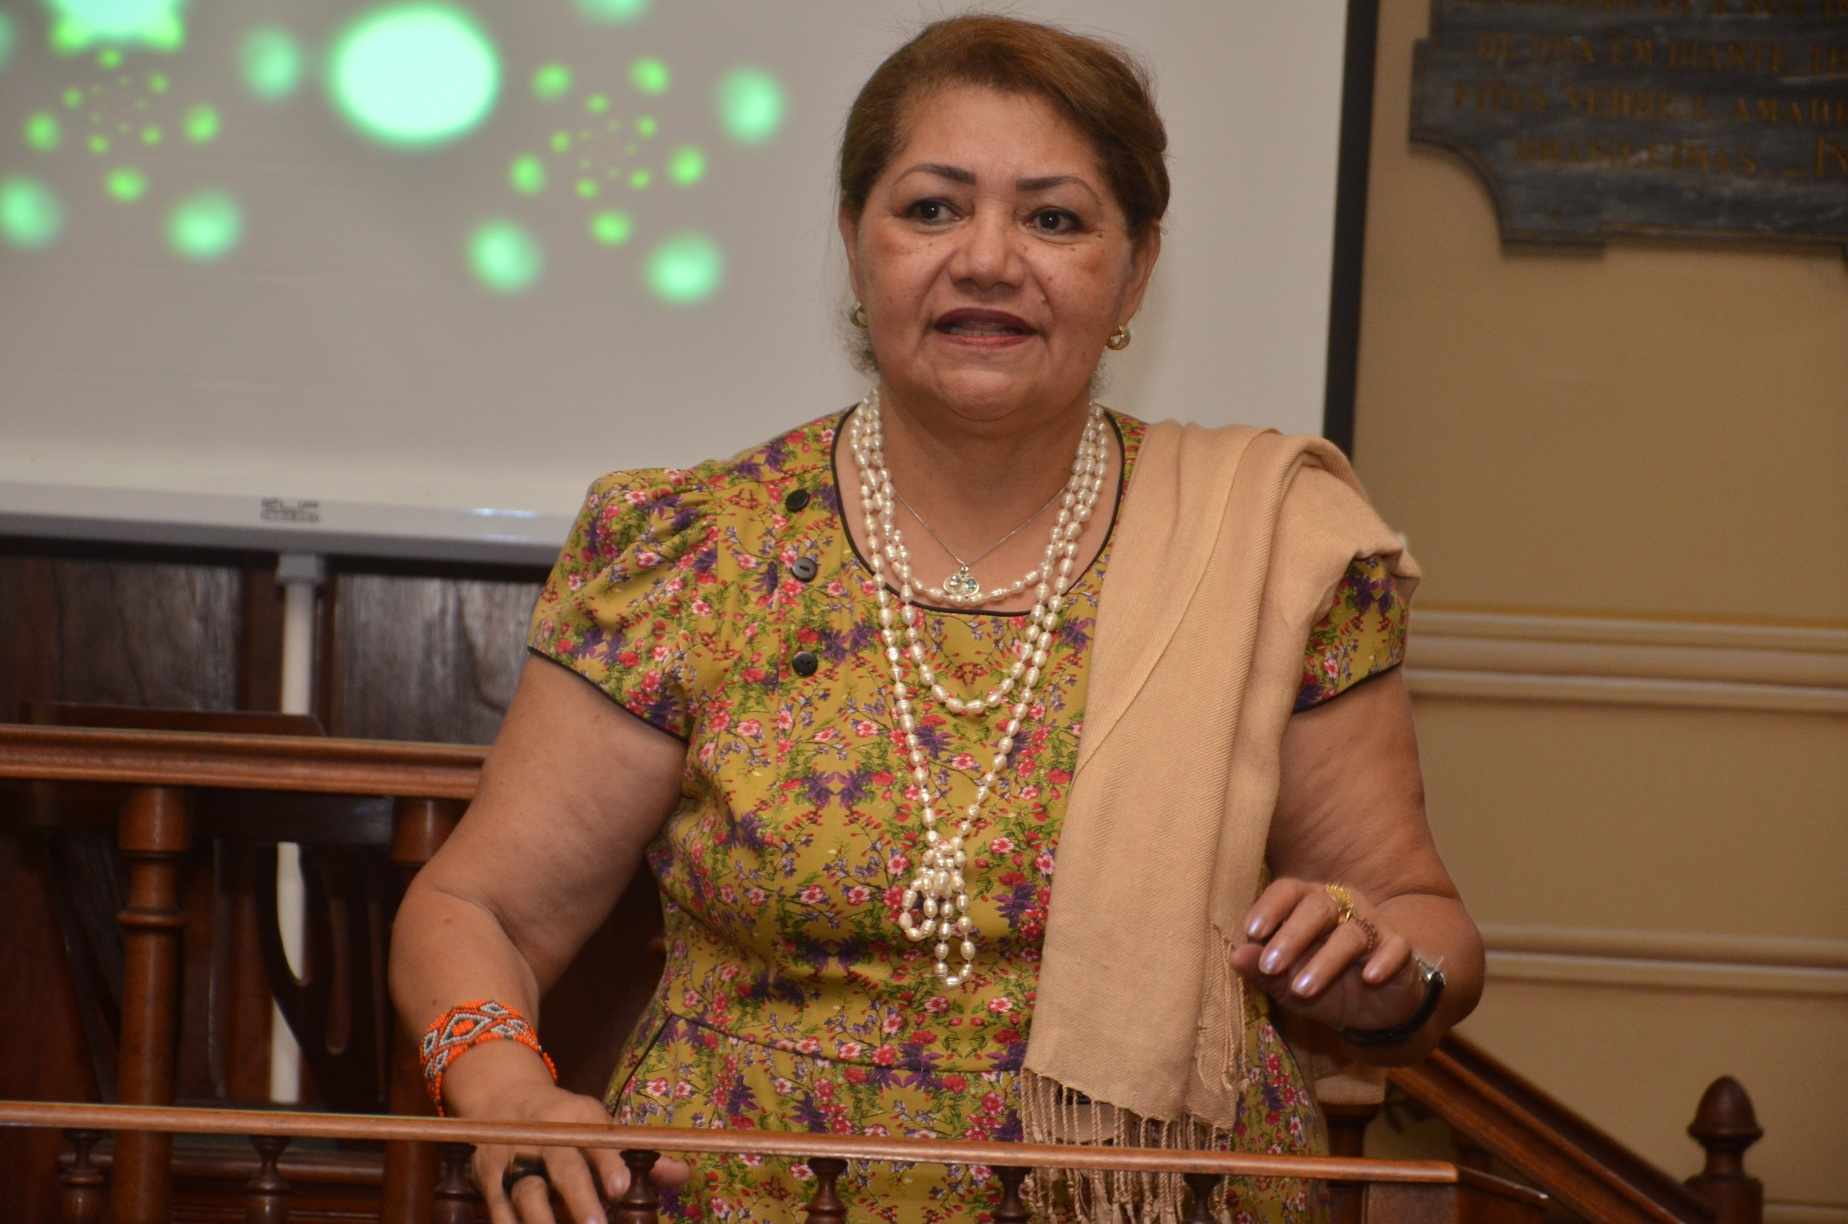 Professor Marilene Freitas given remarks on the film presentation at IGHA.